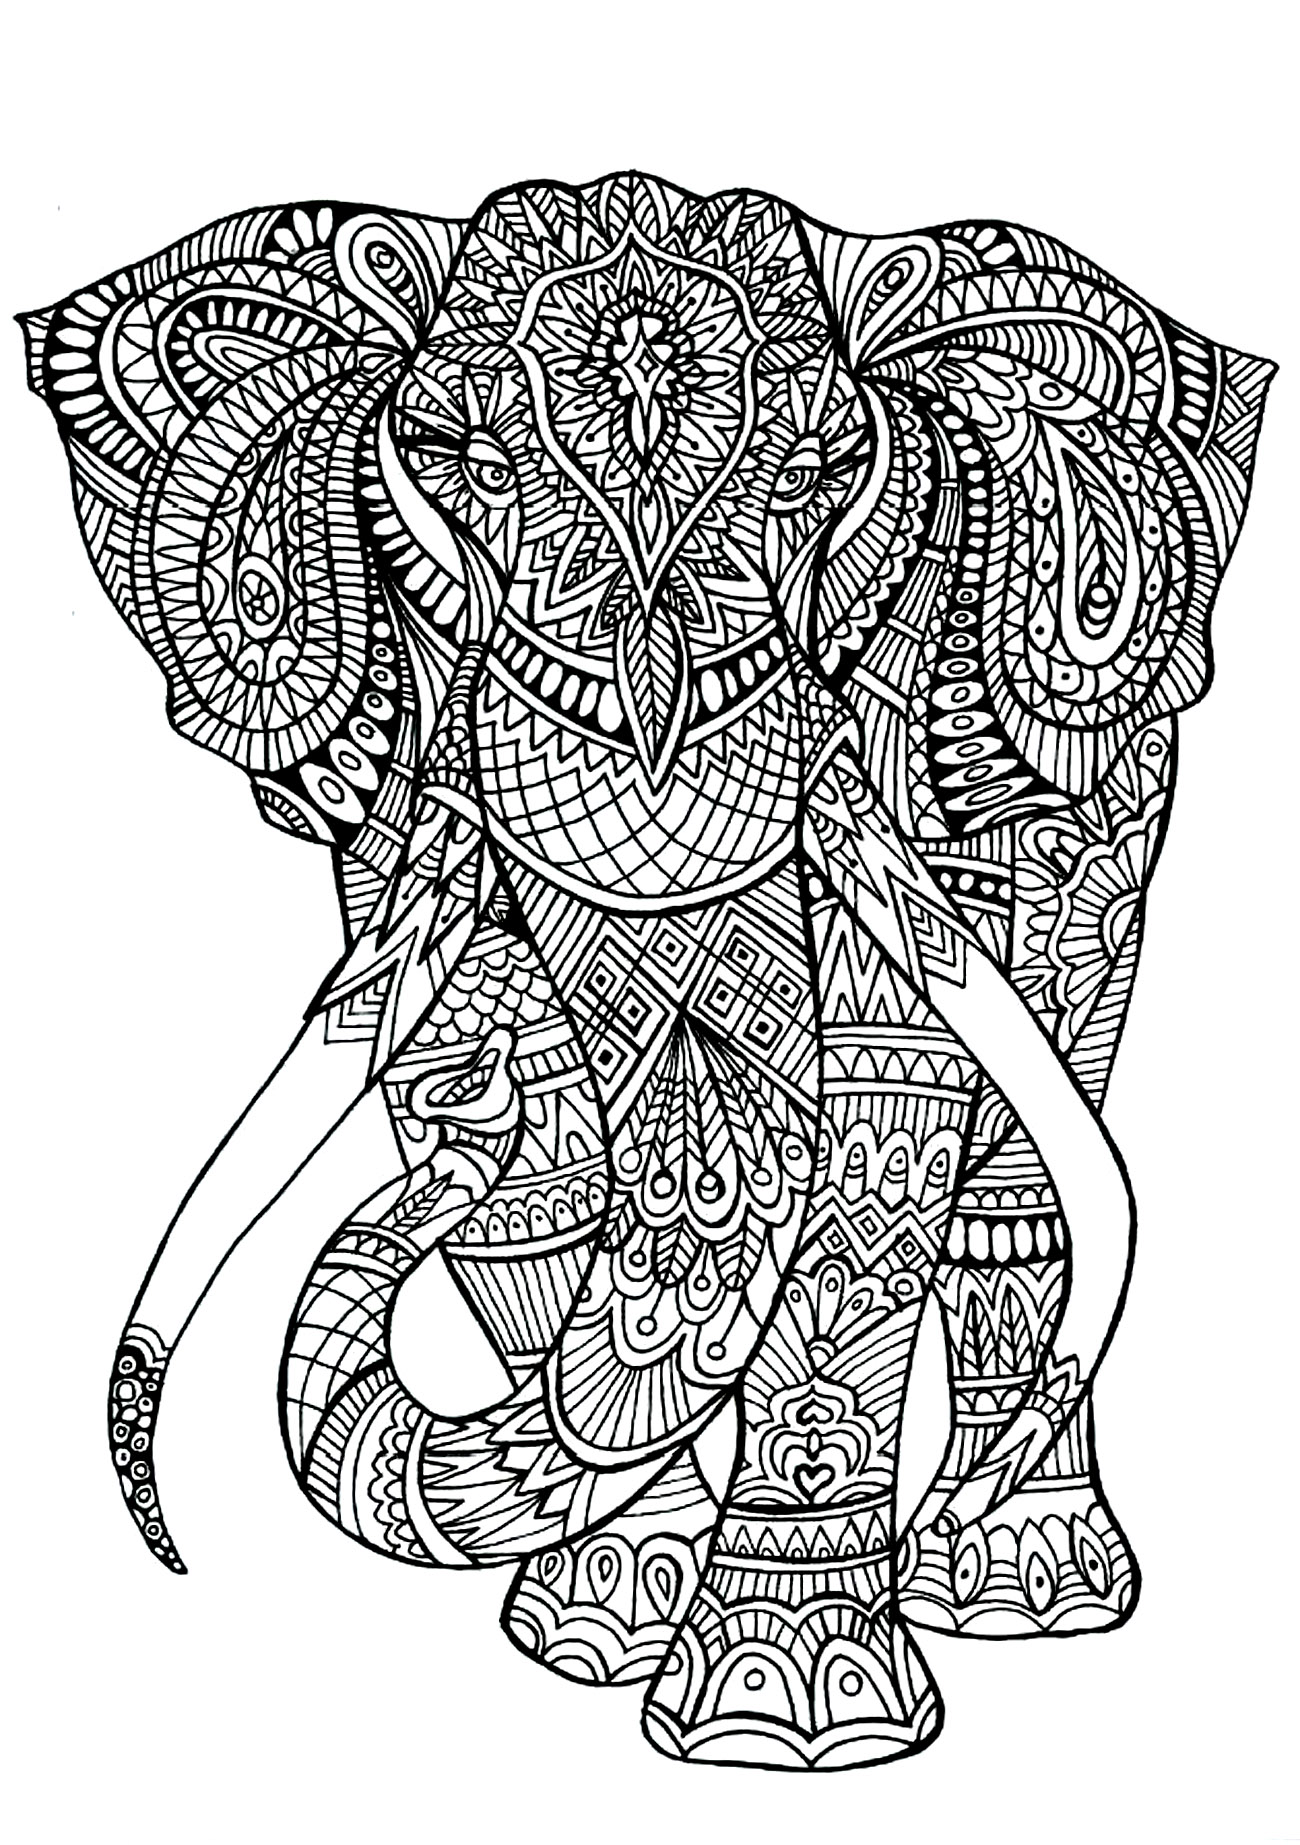 Elephant Animals Coloring Pages 100 Mandalas Zen Anti Stress